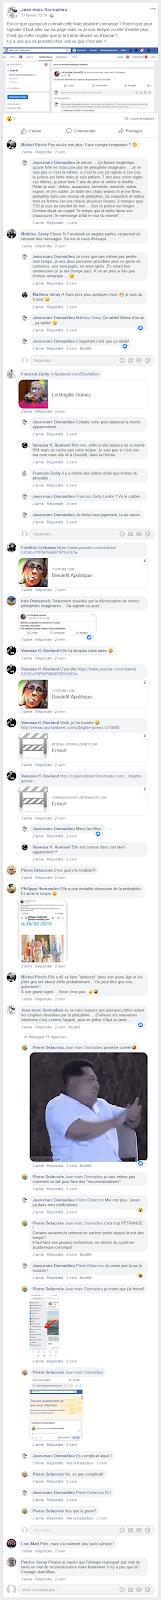 Jean-marc%2BDonnadieu%2B-%2Bwww.facebook.com dans Luraghi